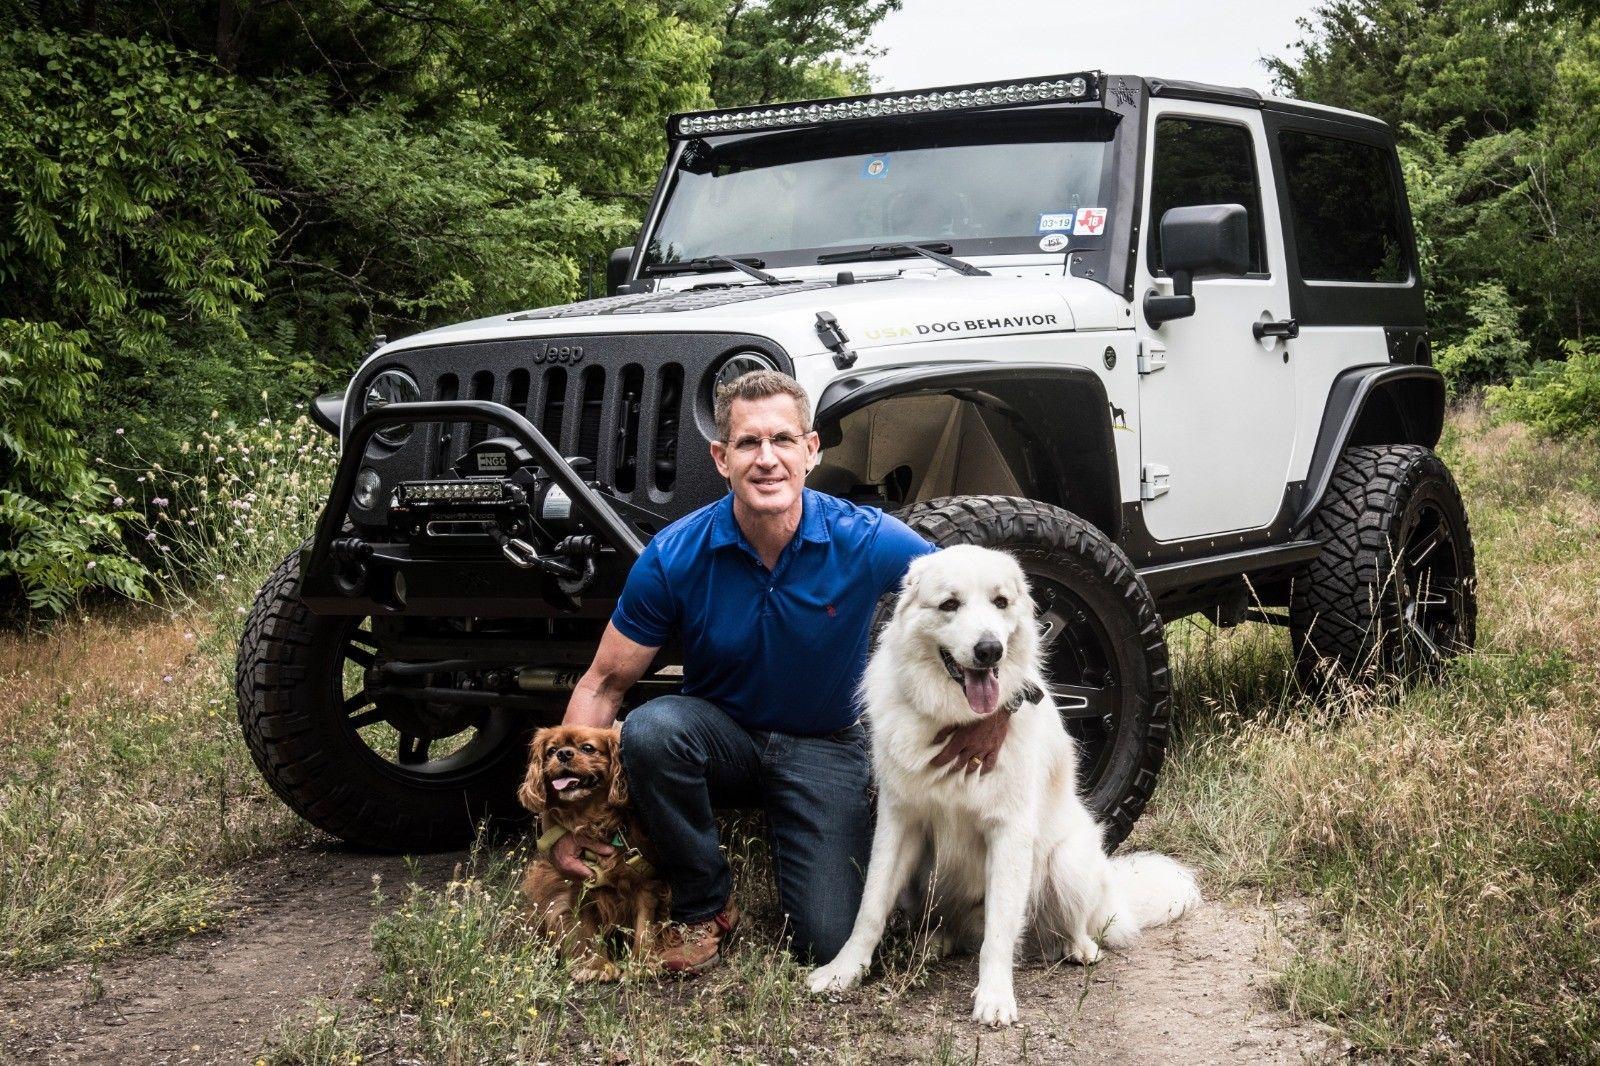 Amazing 2014 Jeep Wrangler JK 2014 Jeep JK, Completely Built, Sprintex  Supercharger, 3 5″ Lift, 35″, Alpine 2018